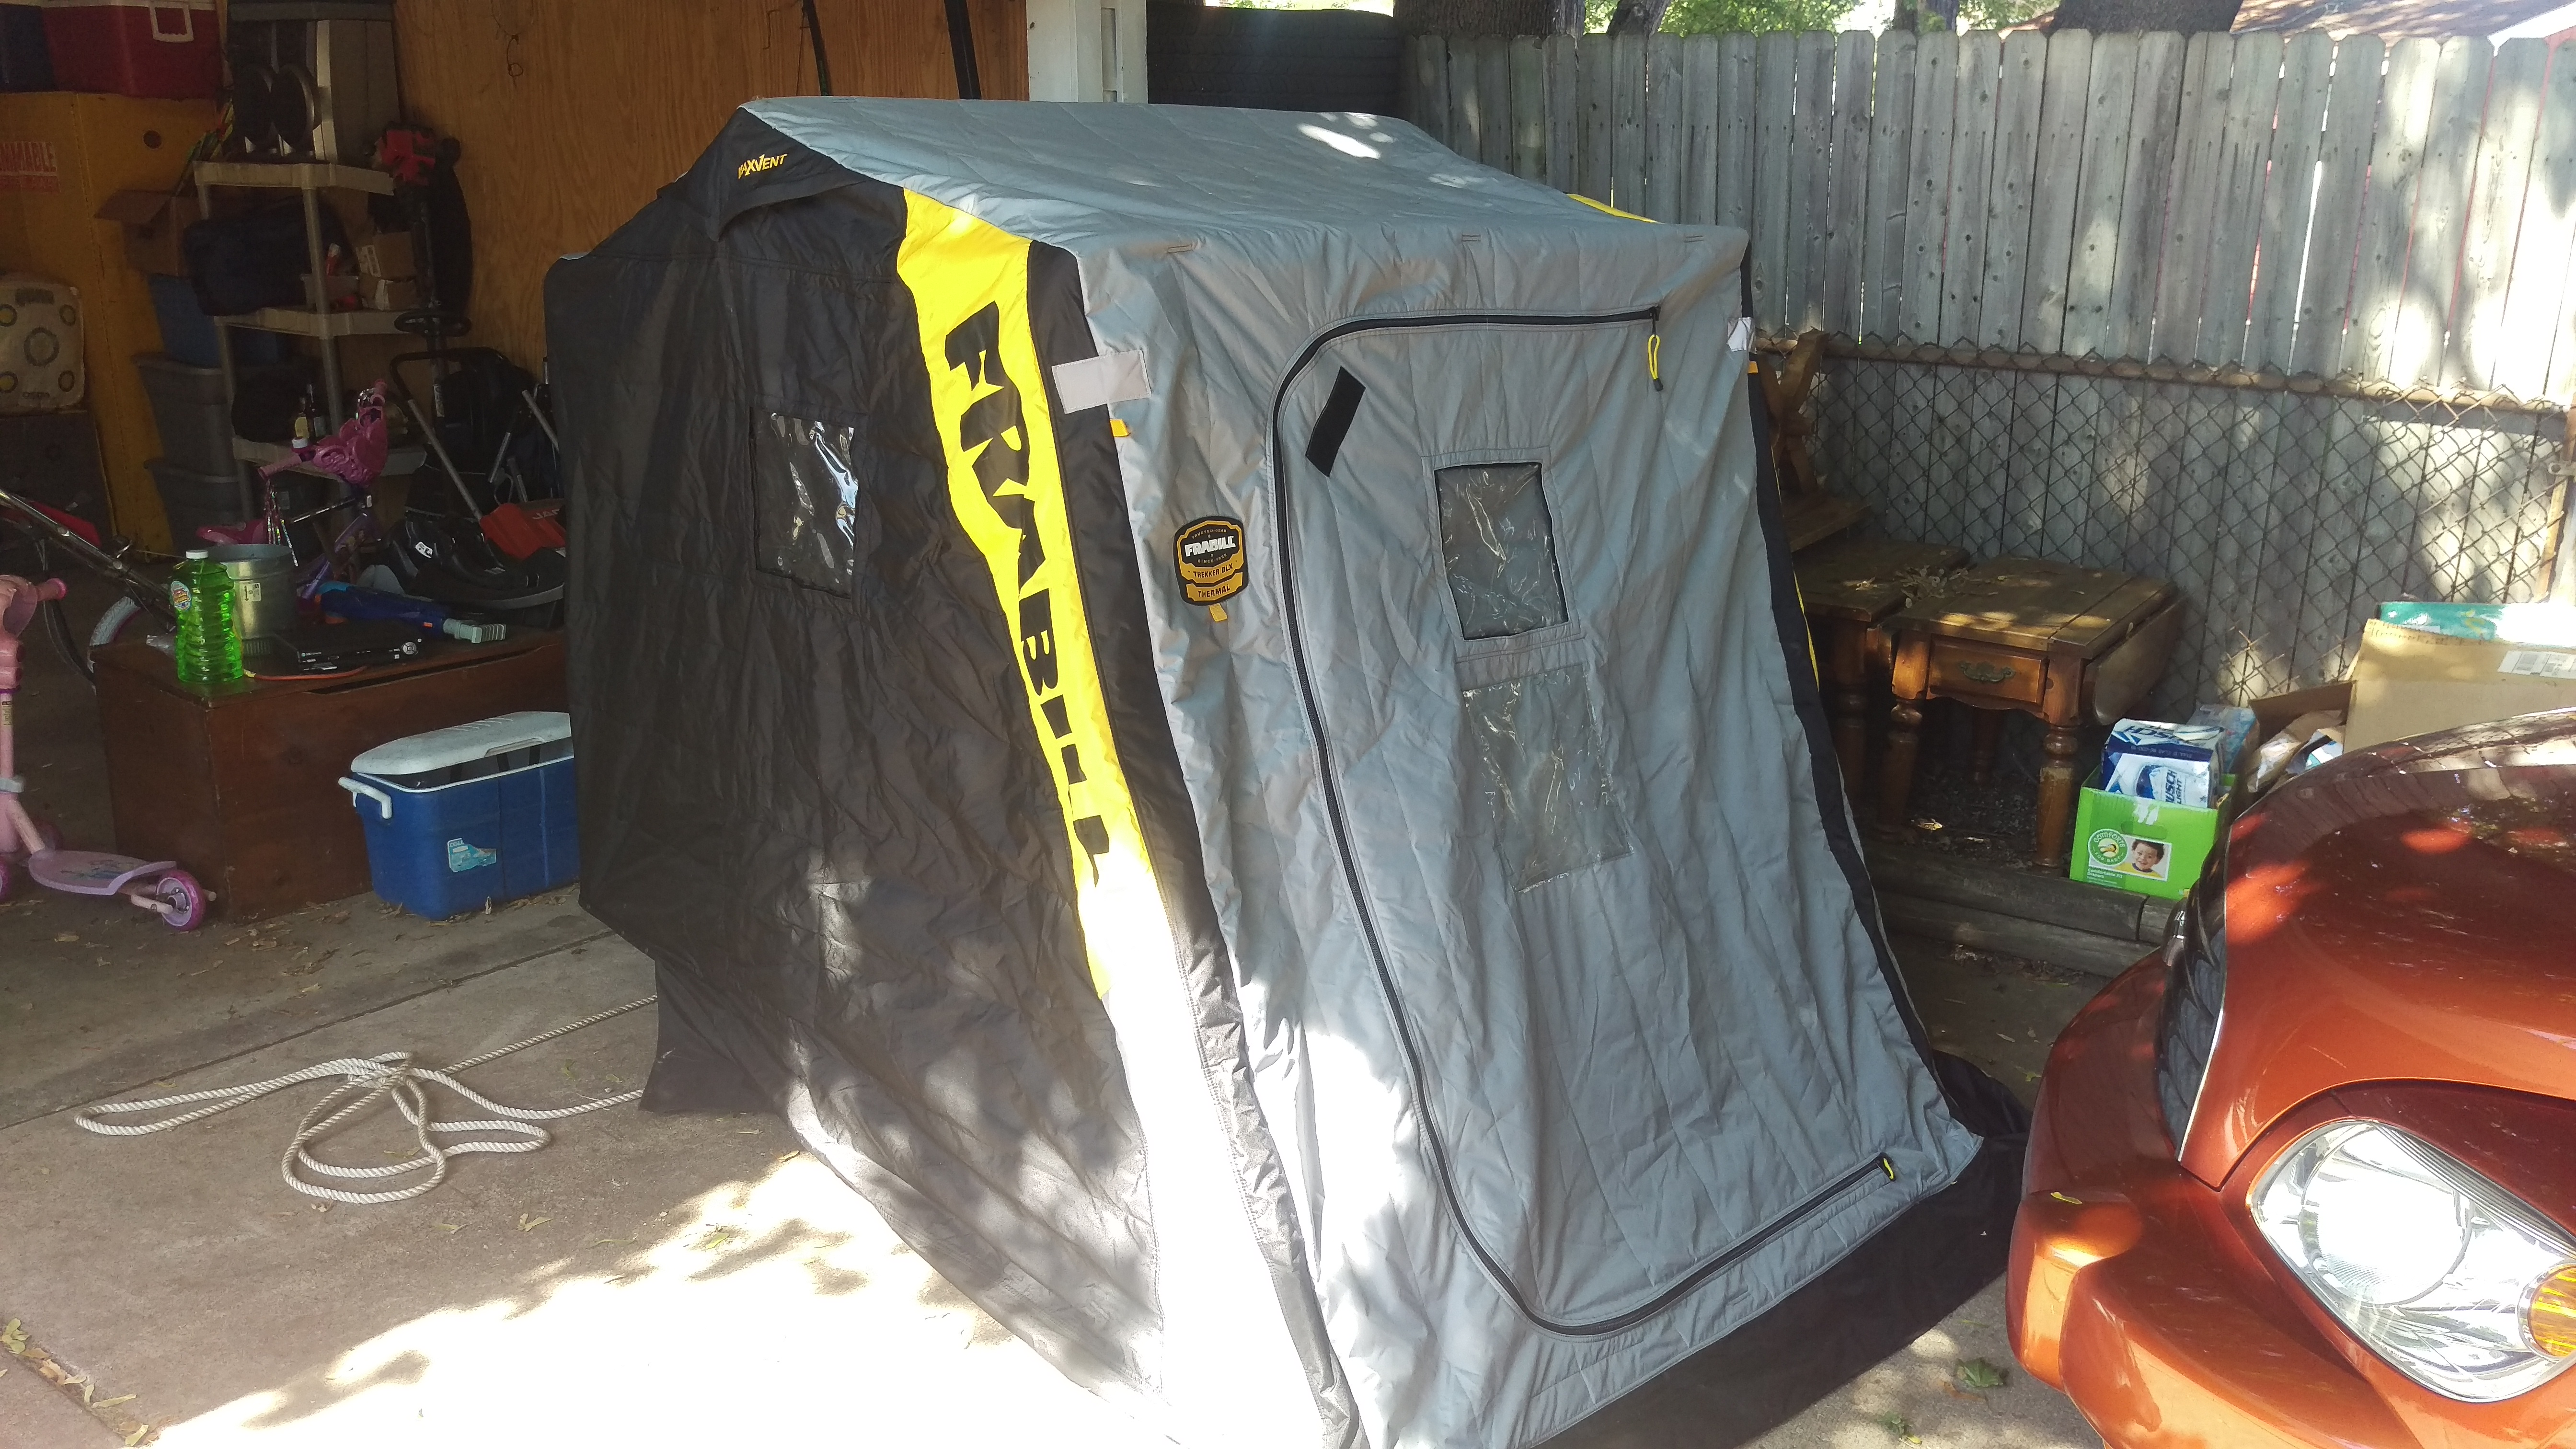 Frabill thermal 2 man shanty | Michigan Sportsman - Online Michigan